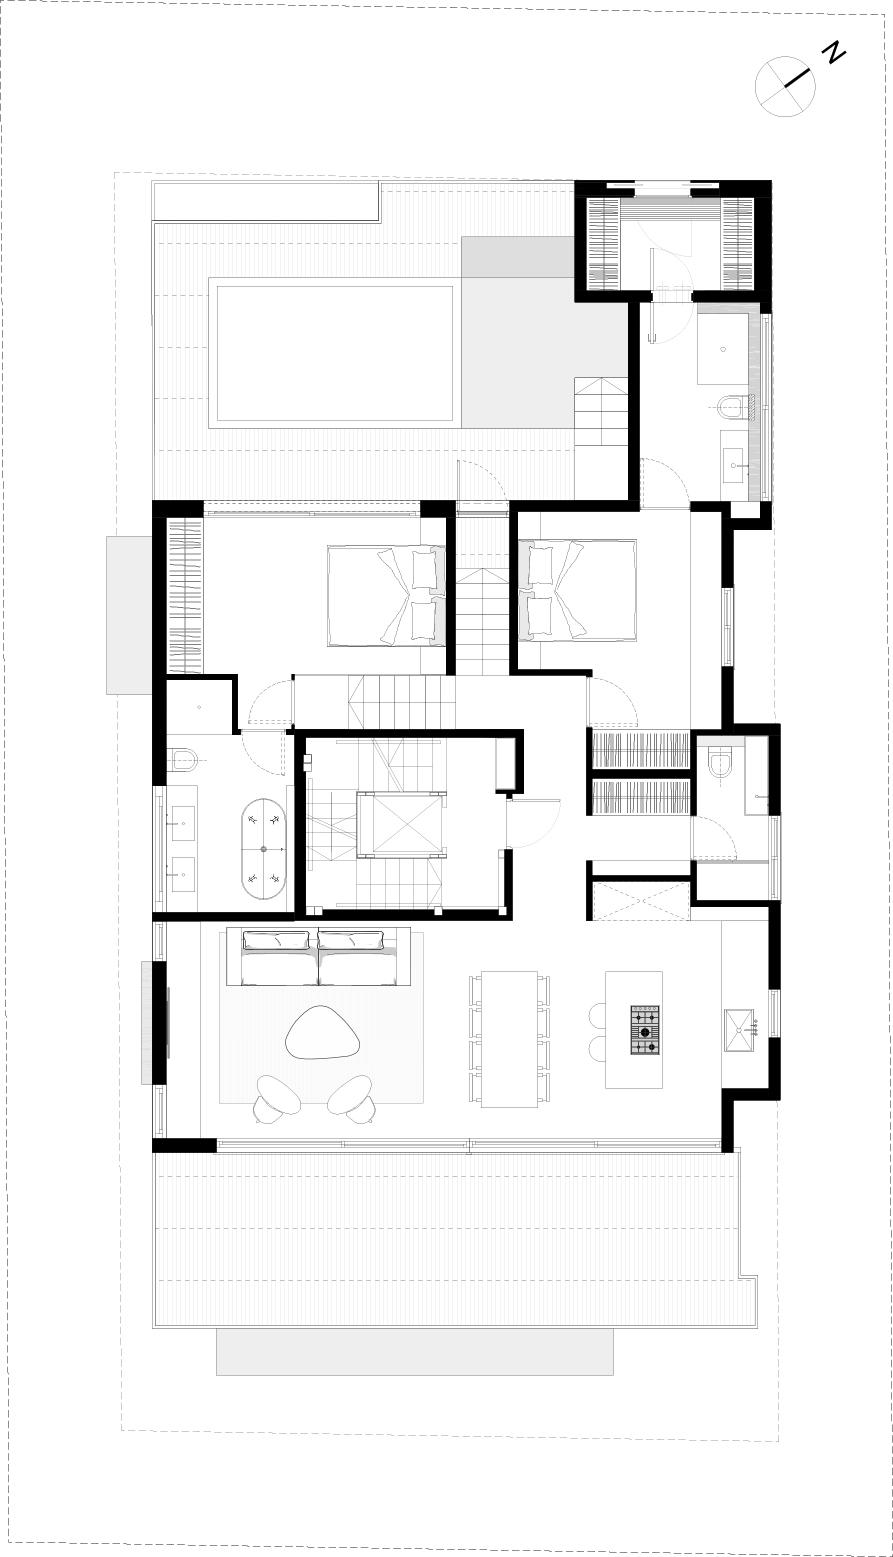 Biron Plan Floor 5.jpg